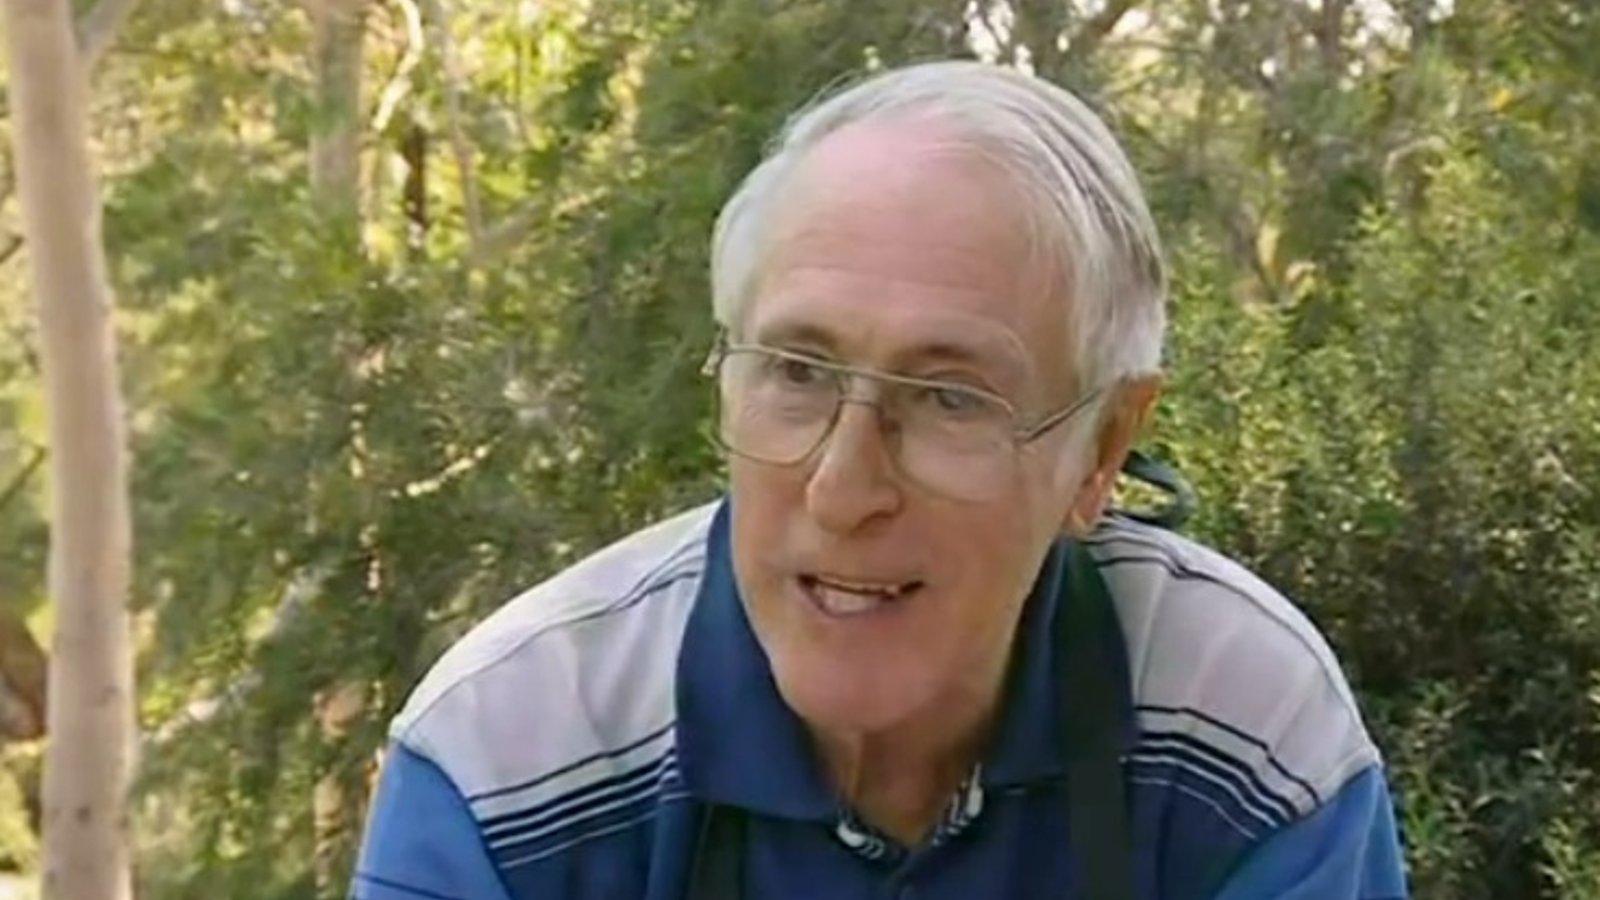 George Negus Tonight - Profiles : Professor Graeme Clark - The Inventor of the Bionic Ear